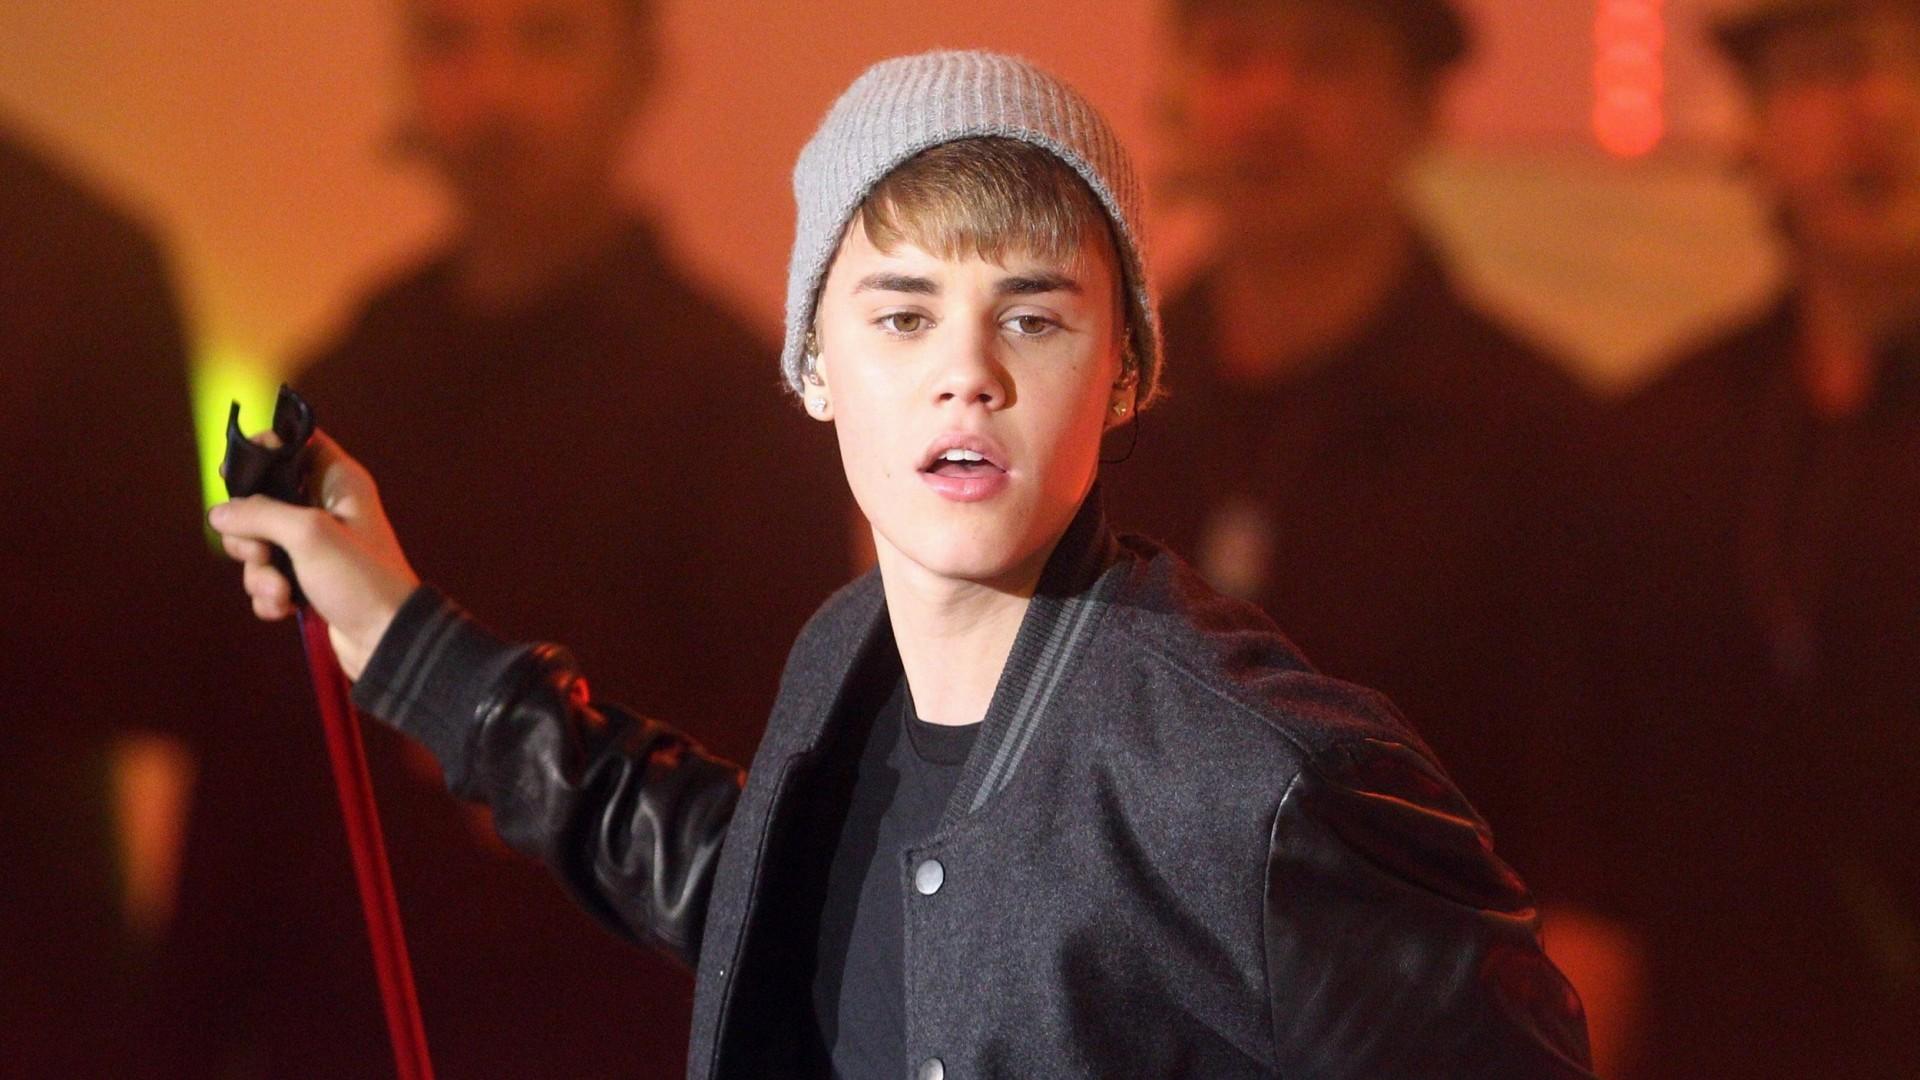 American Football Quotes Wallpaper Justin Bieber Wallpaper Hd Pixelstalk Net